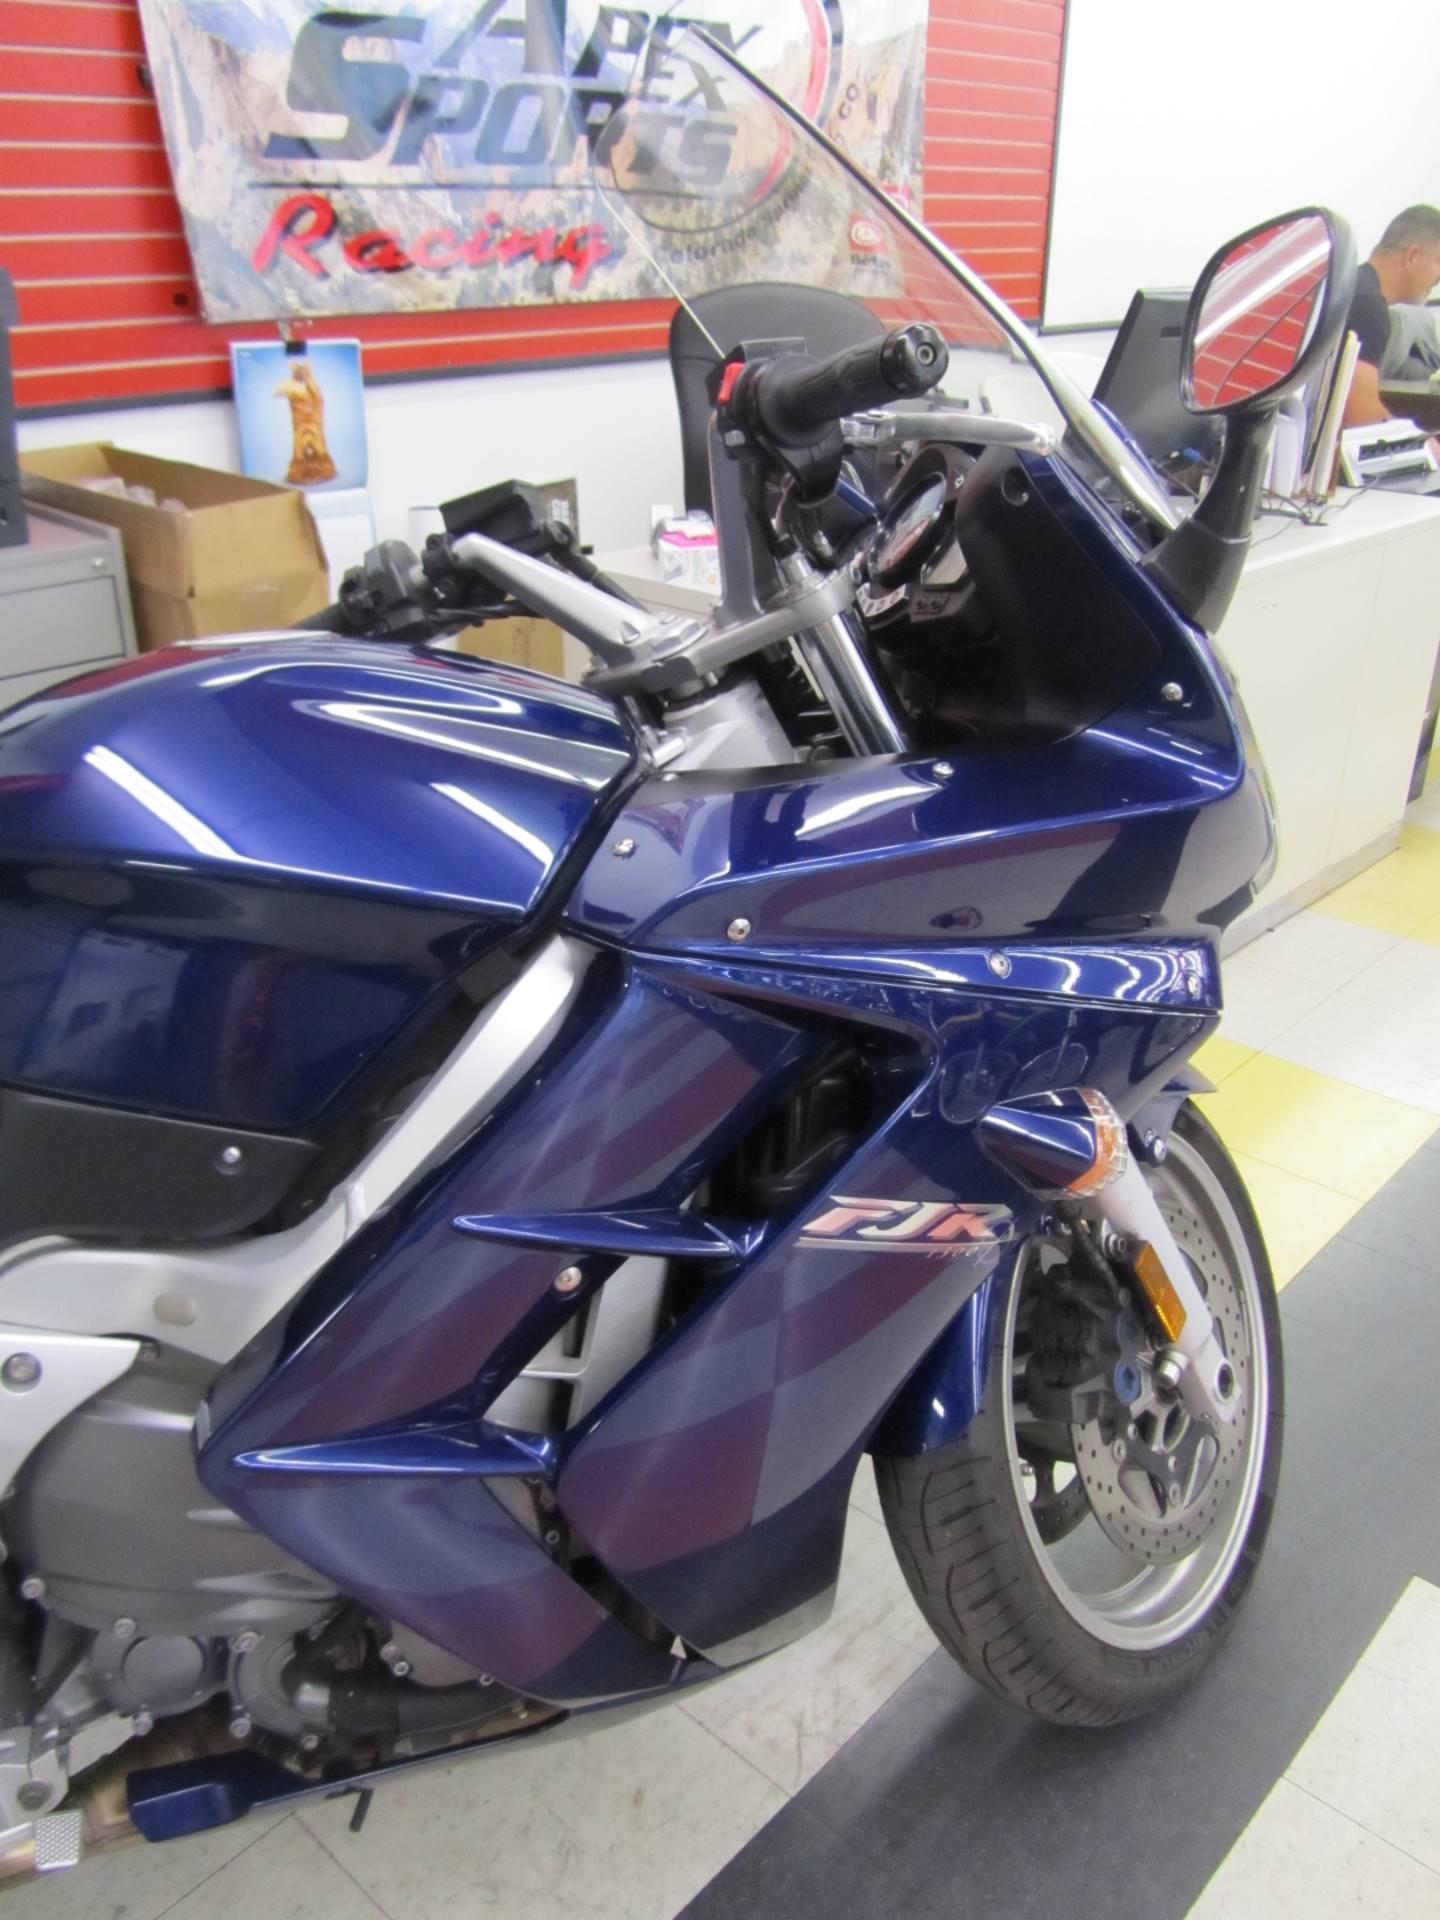 2005 Yamaha FJR 1300A 6